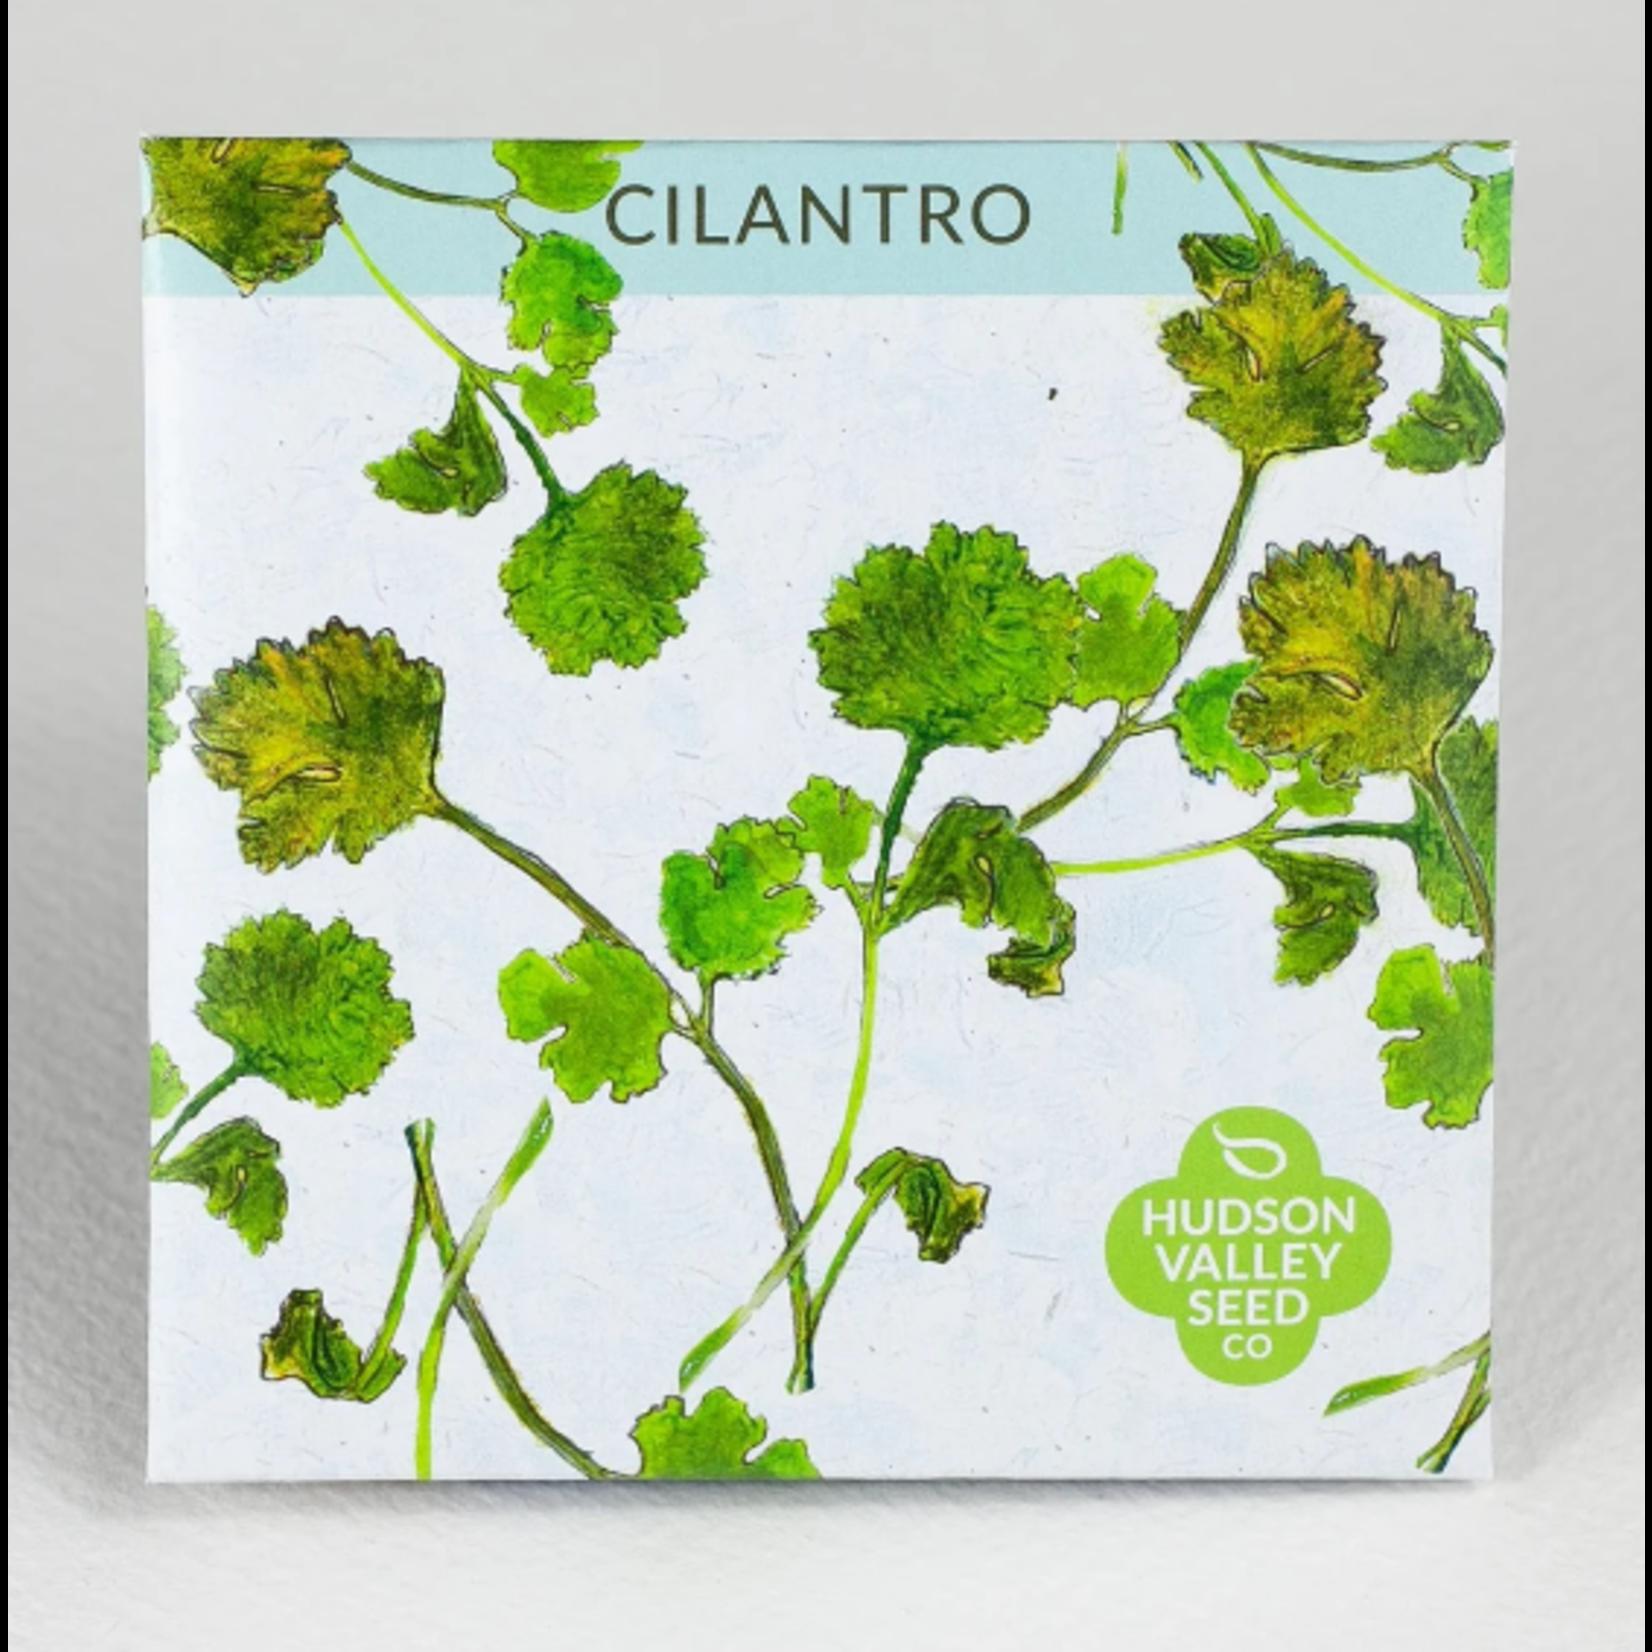 Hudson Valley Seeds Cilantro Seeds